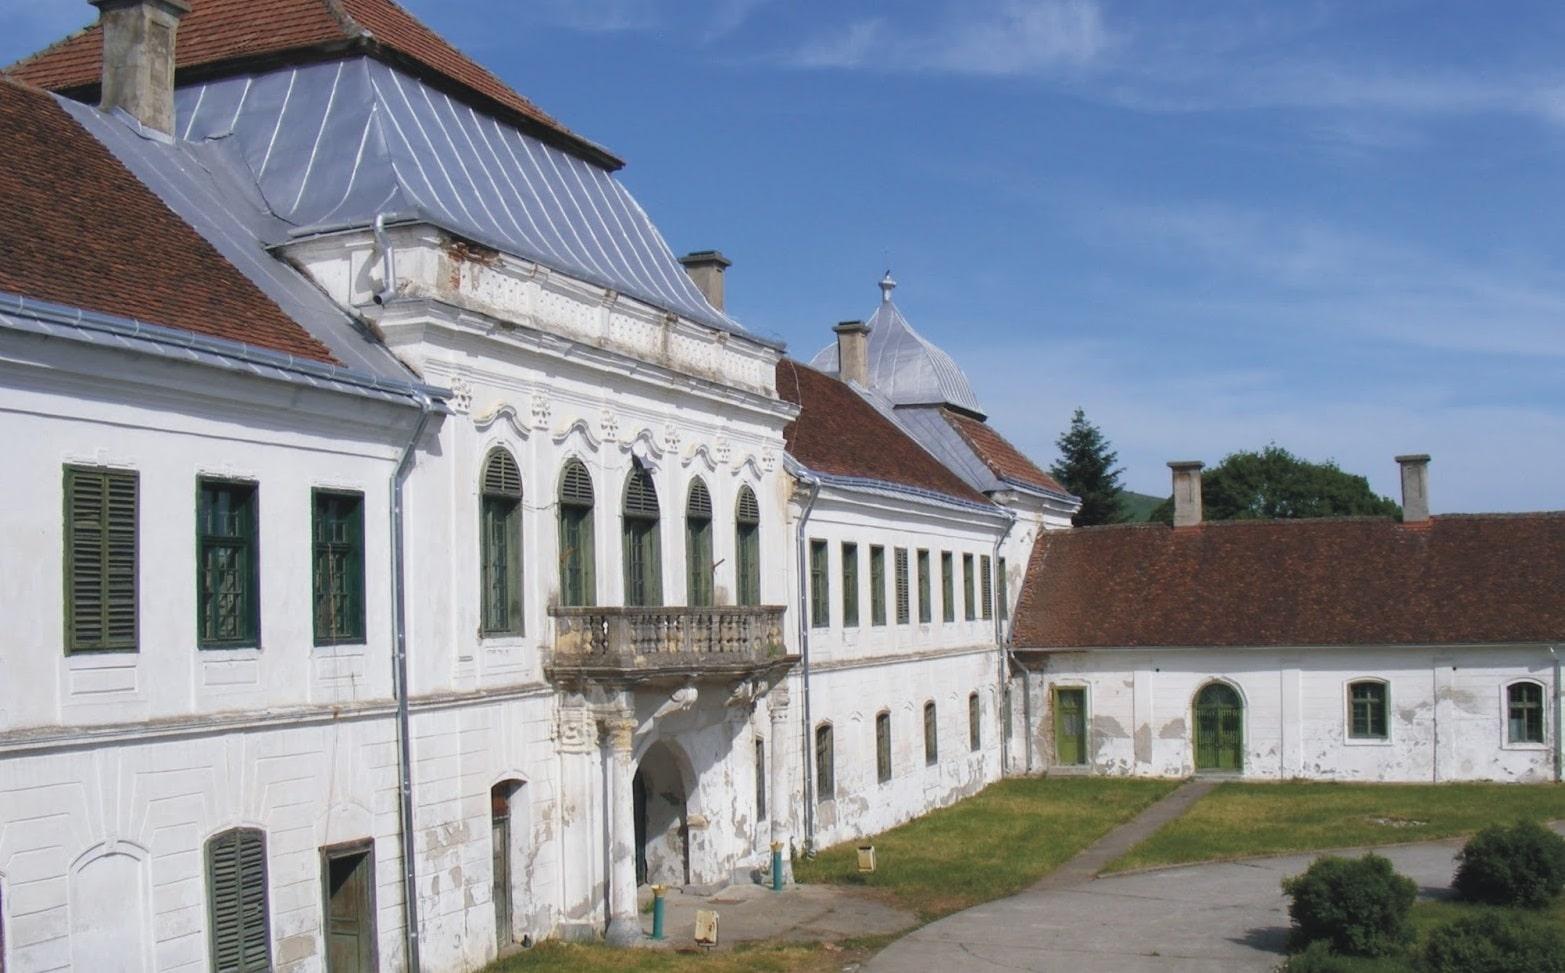 Castelul Wesselenyi văzut din lateral